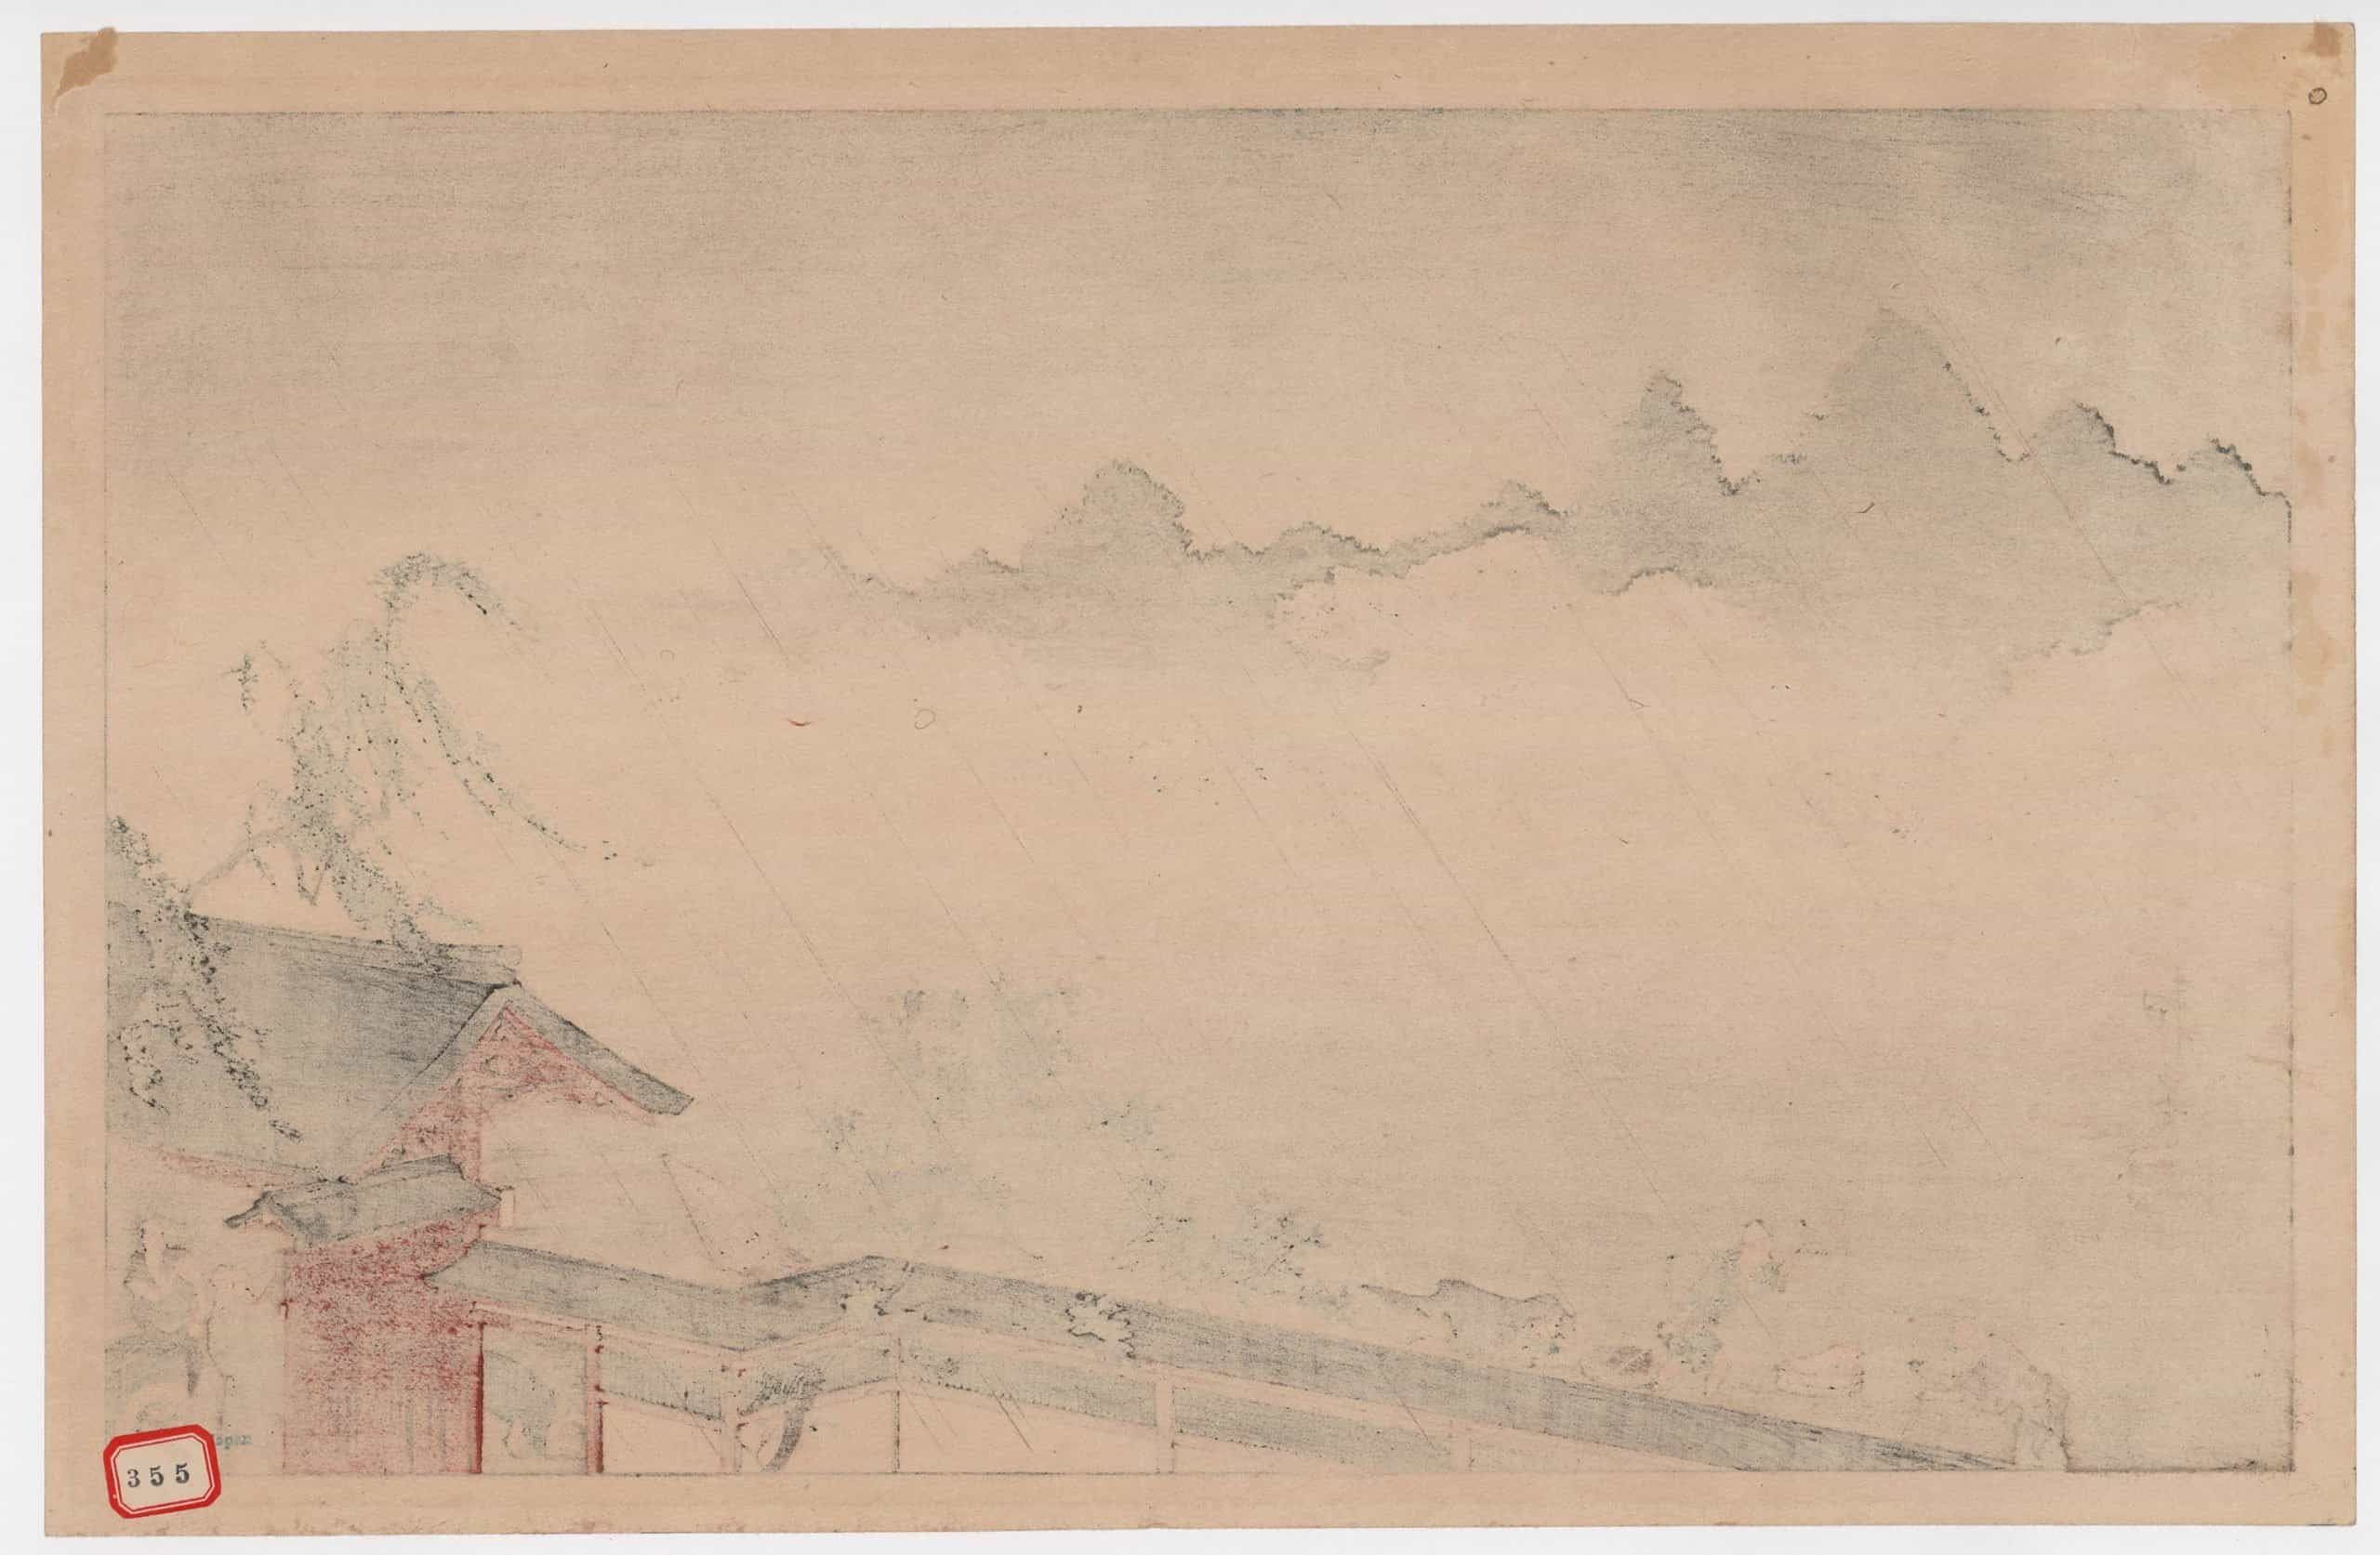 Shoda Koho - Sudden Shower on Cherry Blossoms (verso)